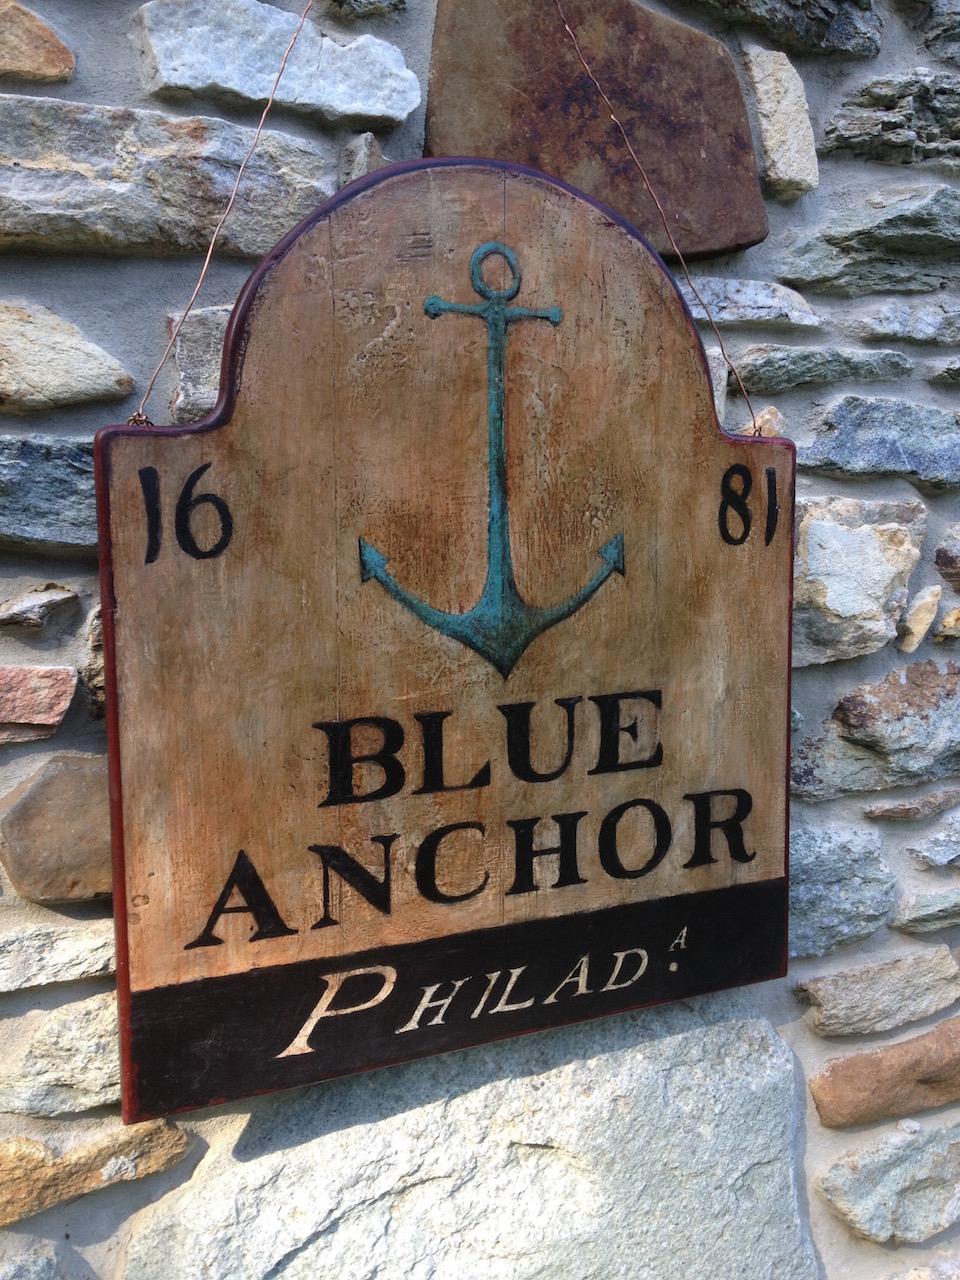 Blue Anchor Tavern (Phila., PA)